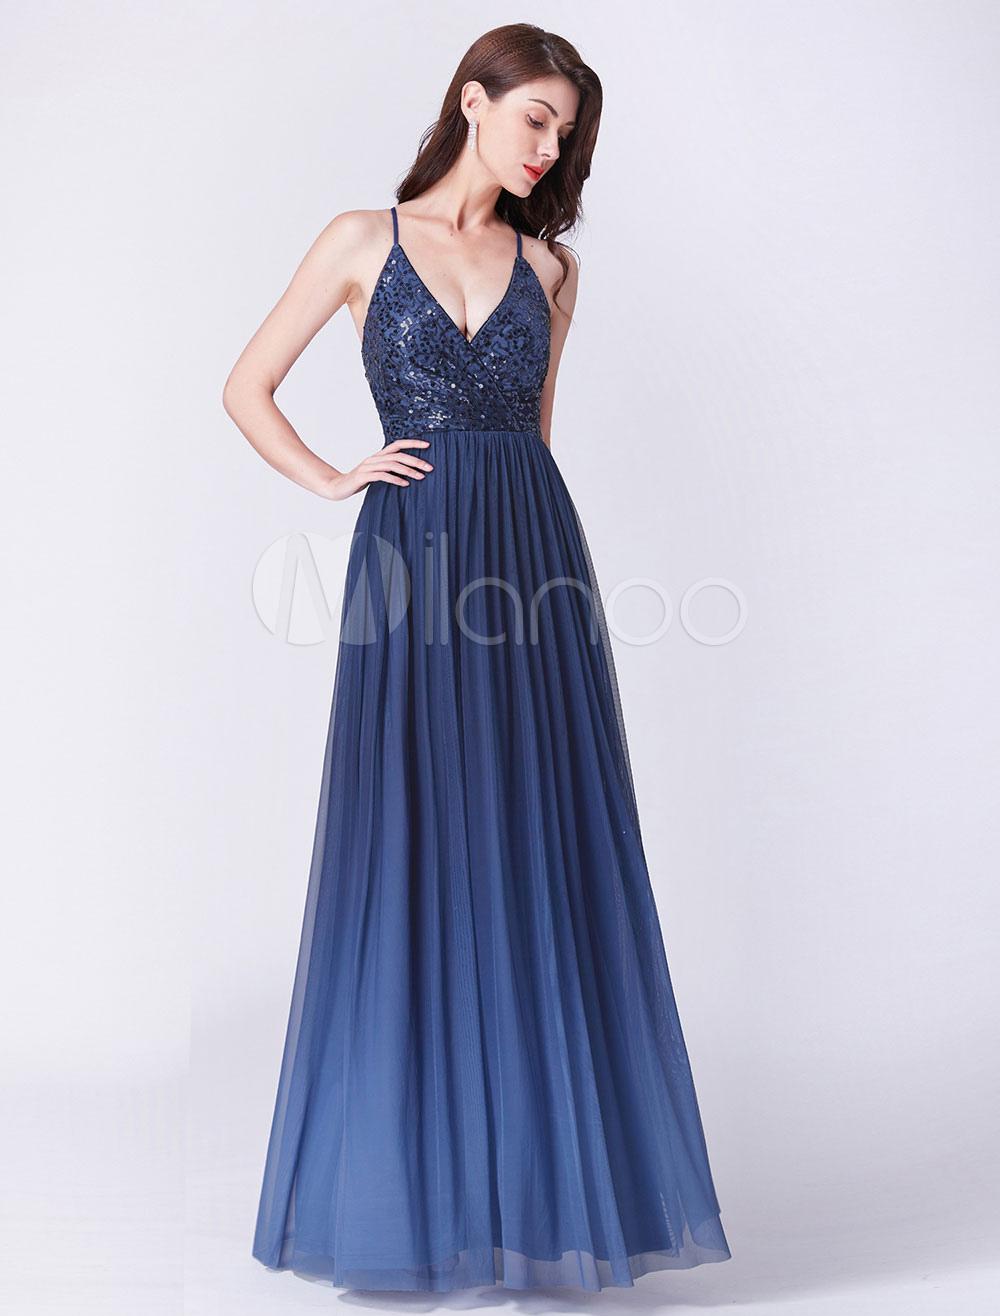 00e6feac153c5 Bridesmaid Dresses Long Royal Blue Prom Dress Sequin Chiffon Straps ...